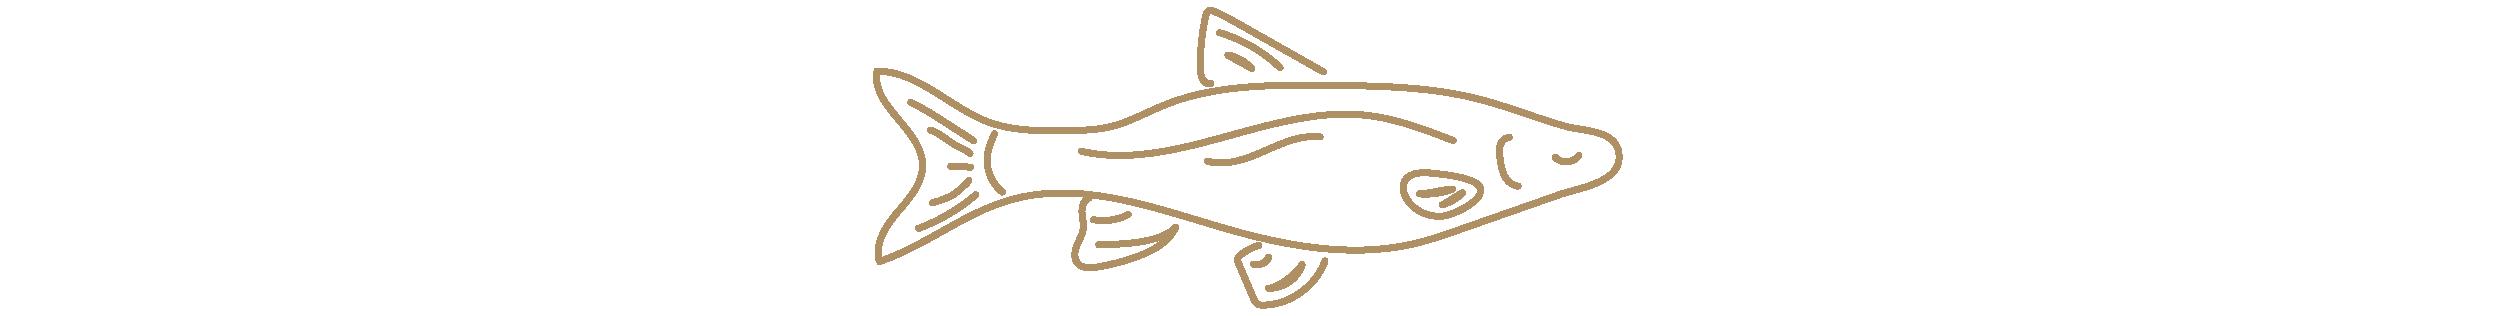 Bar Pesce - Fish Footer-11.png